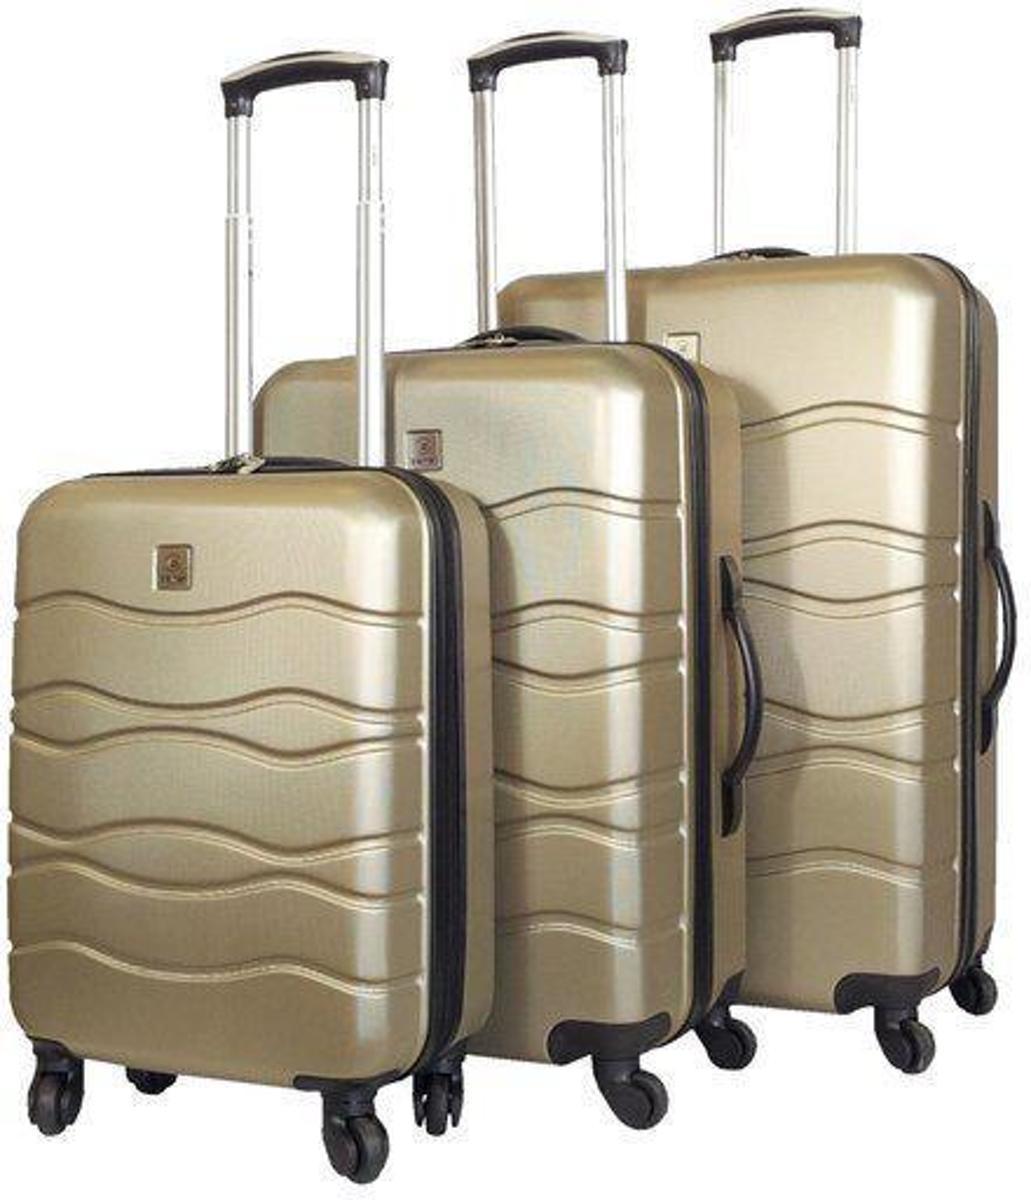 Benzi ABS kofferset 3-delig Wave -champagne kopen